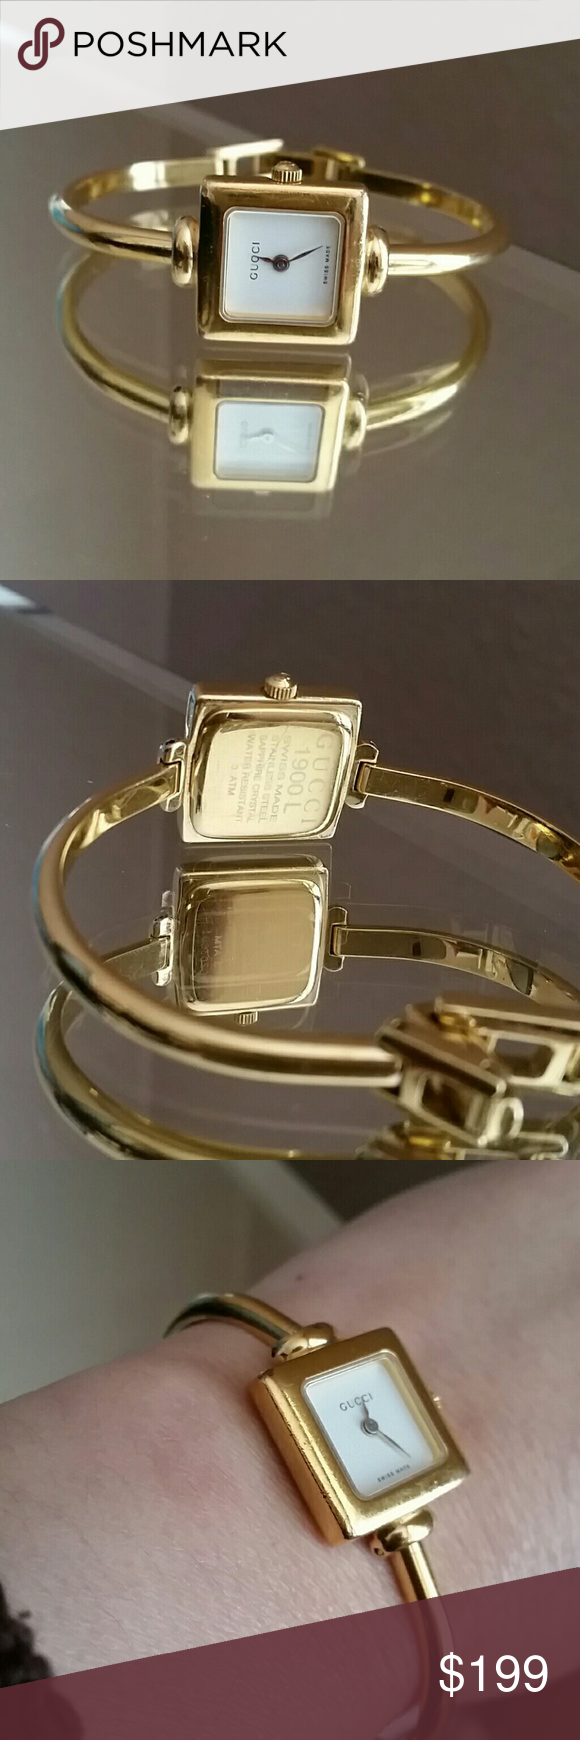 7714453d8cd Authentic Gucci Quartz Square Face Bangle Watch Beautiful rare Gucci watch